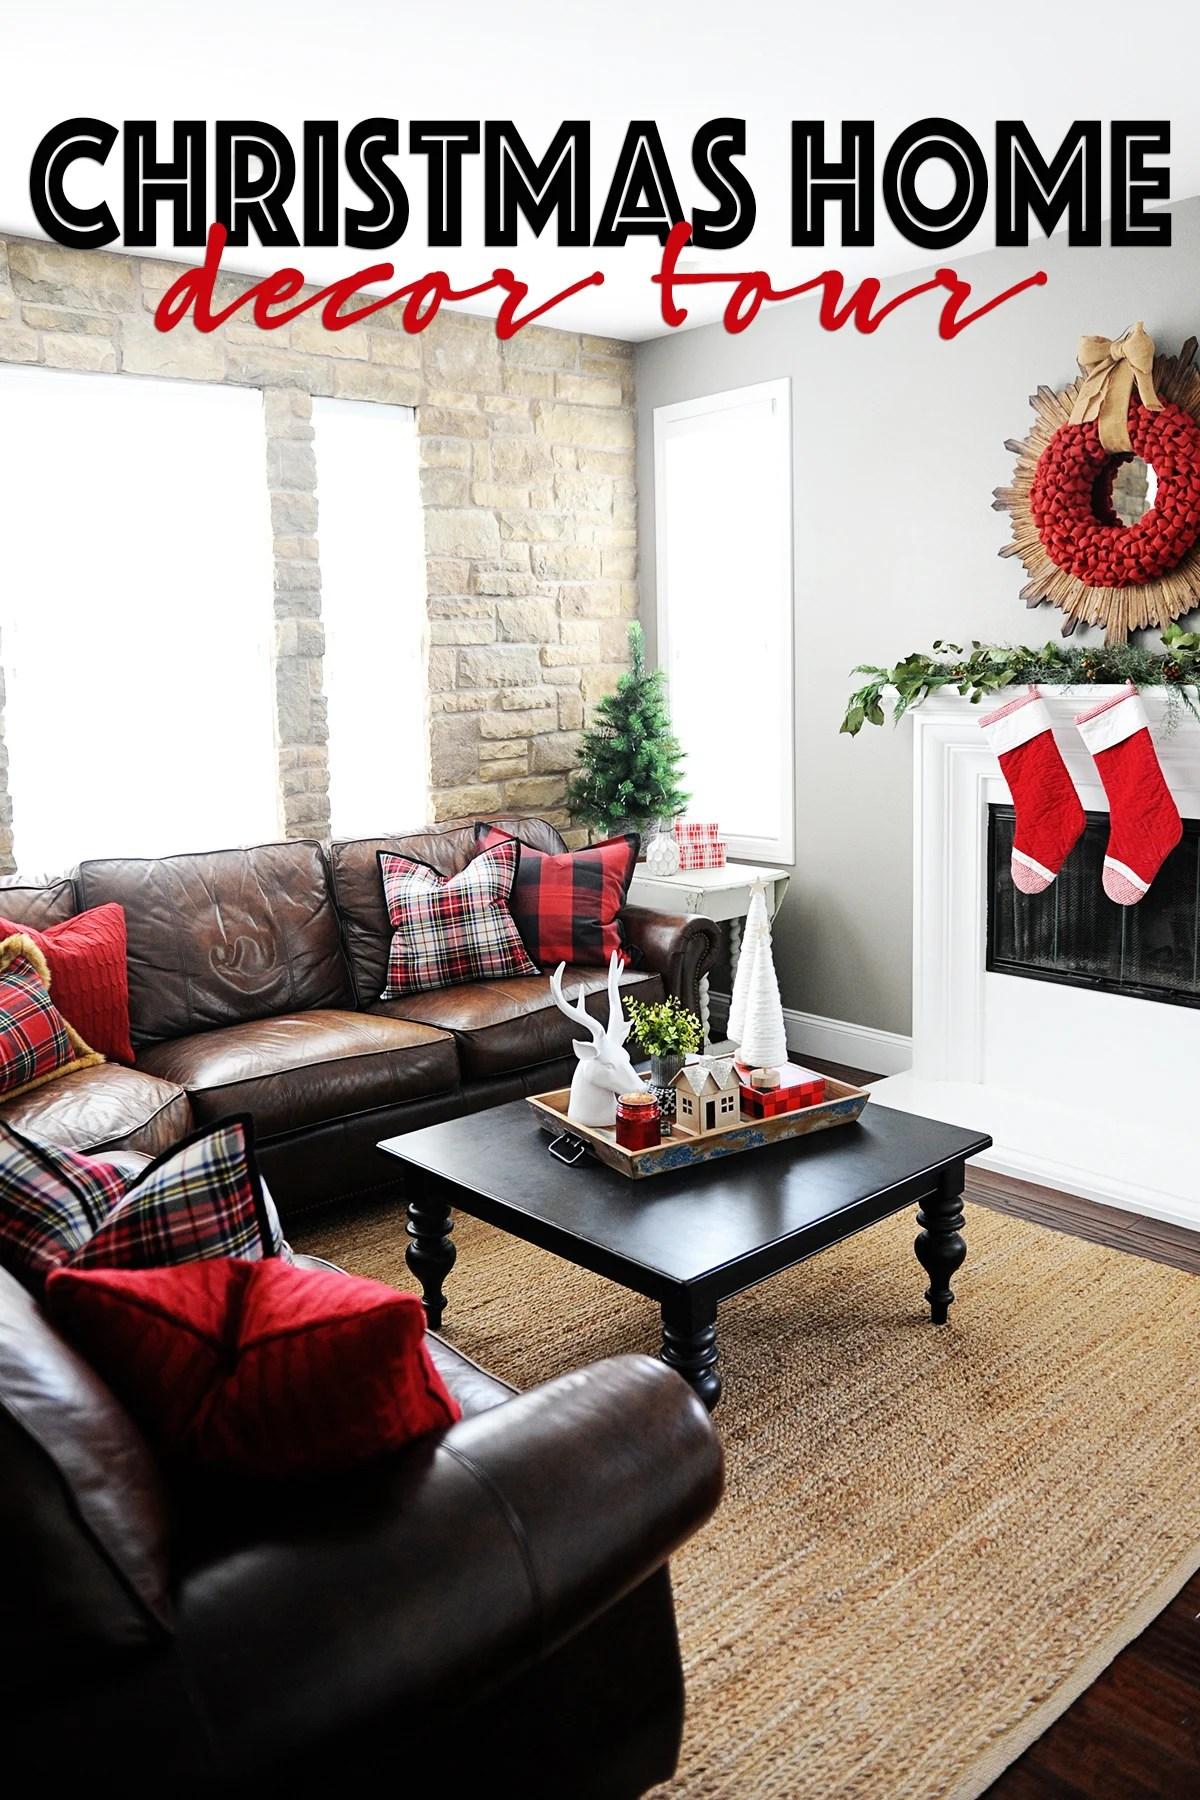 Christmas Home Decor : Our Christmas Home Tour